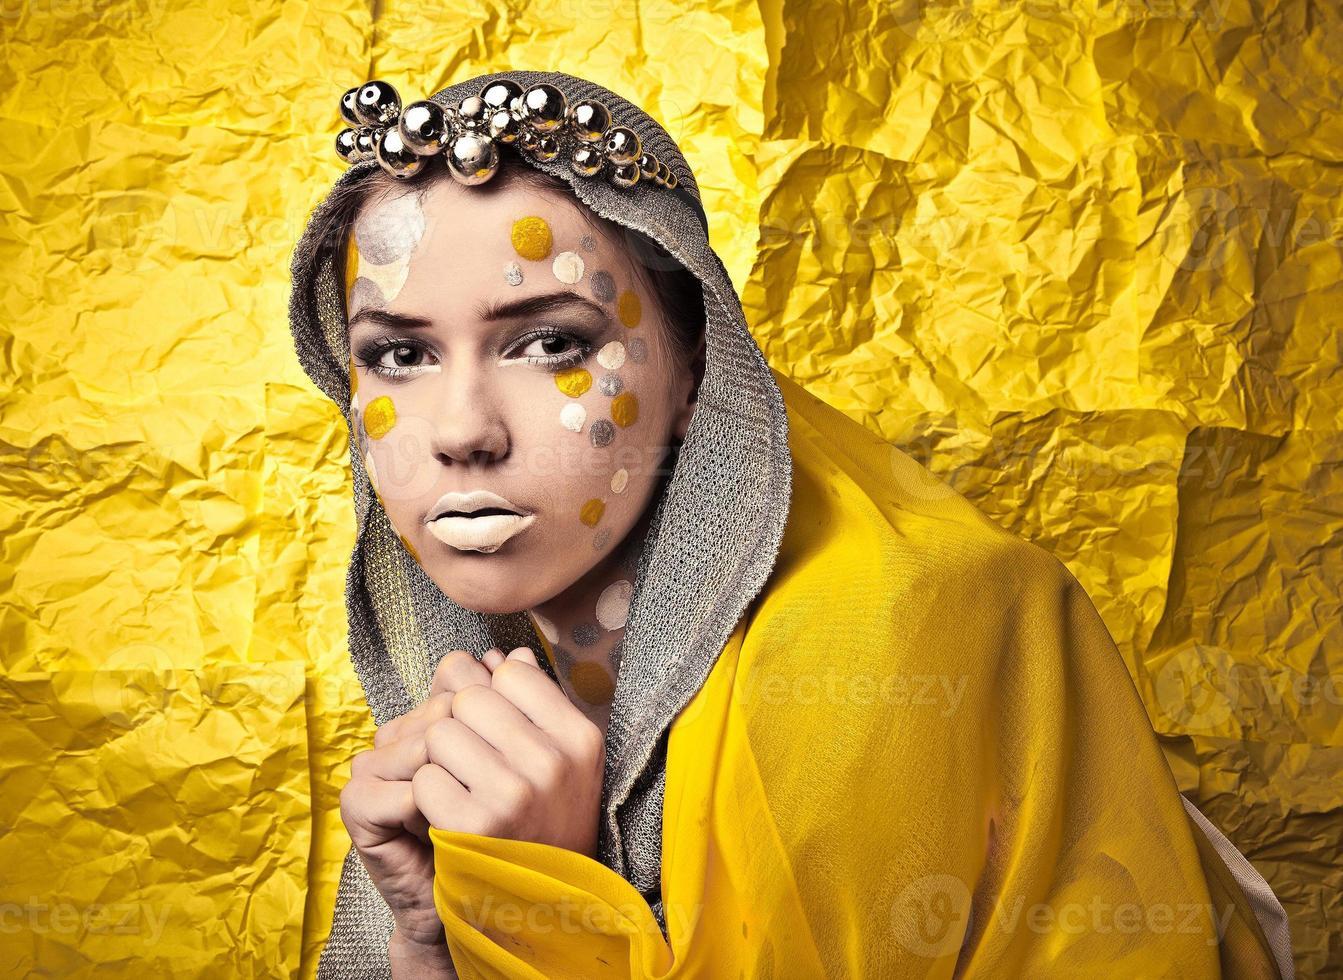 mode belle femme sur fond jaune grunge. photo